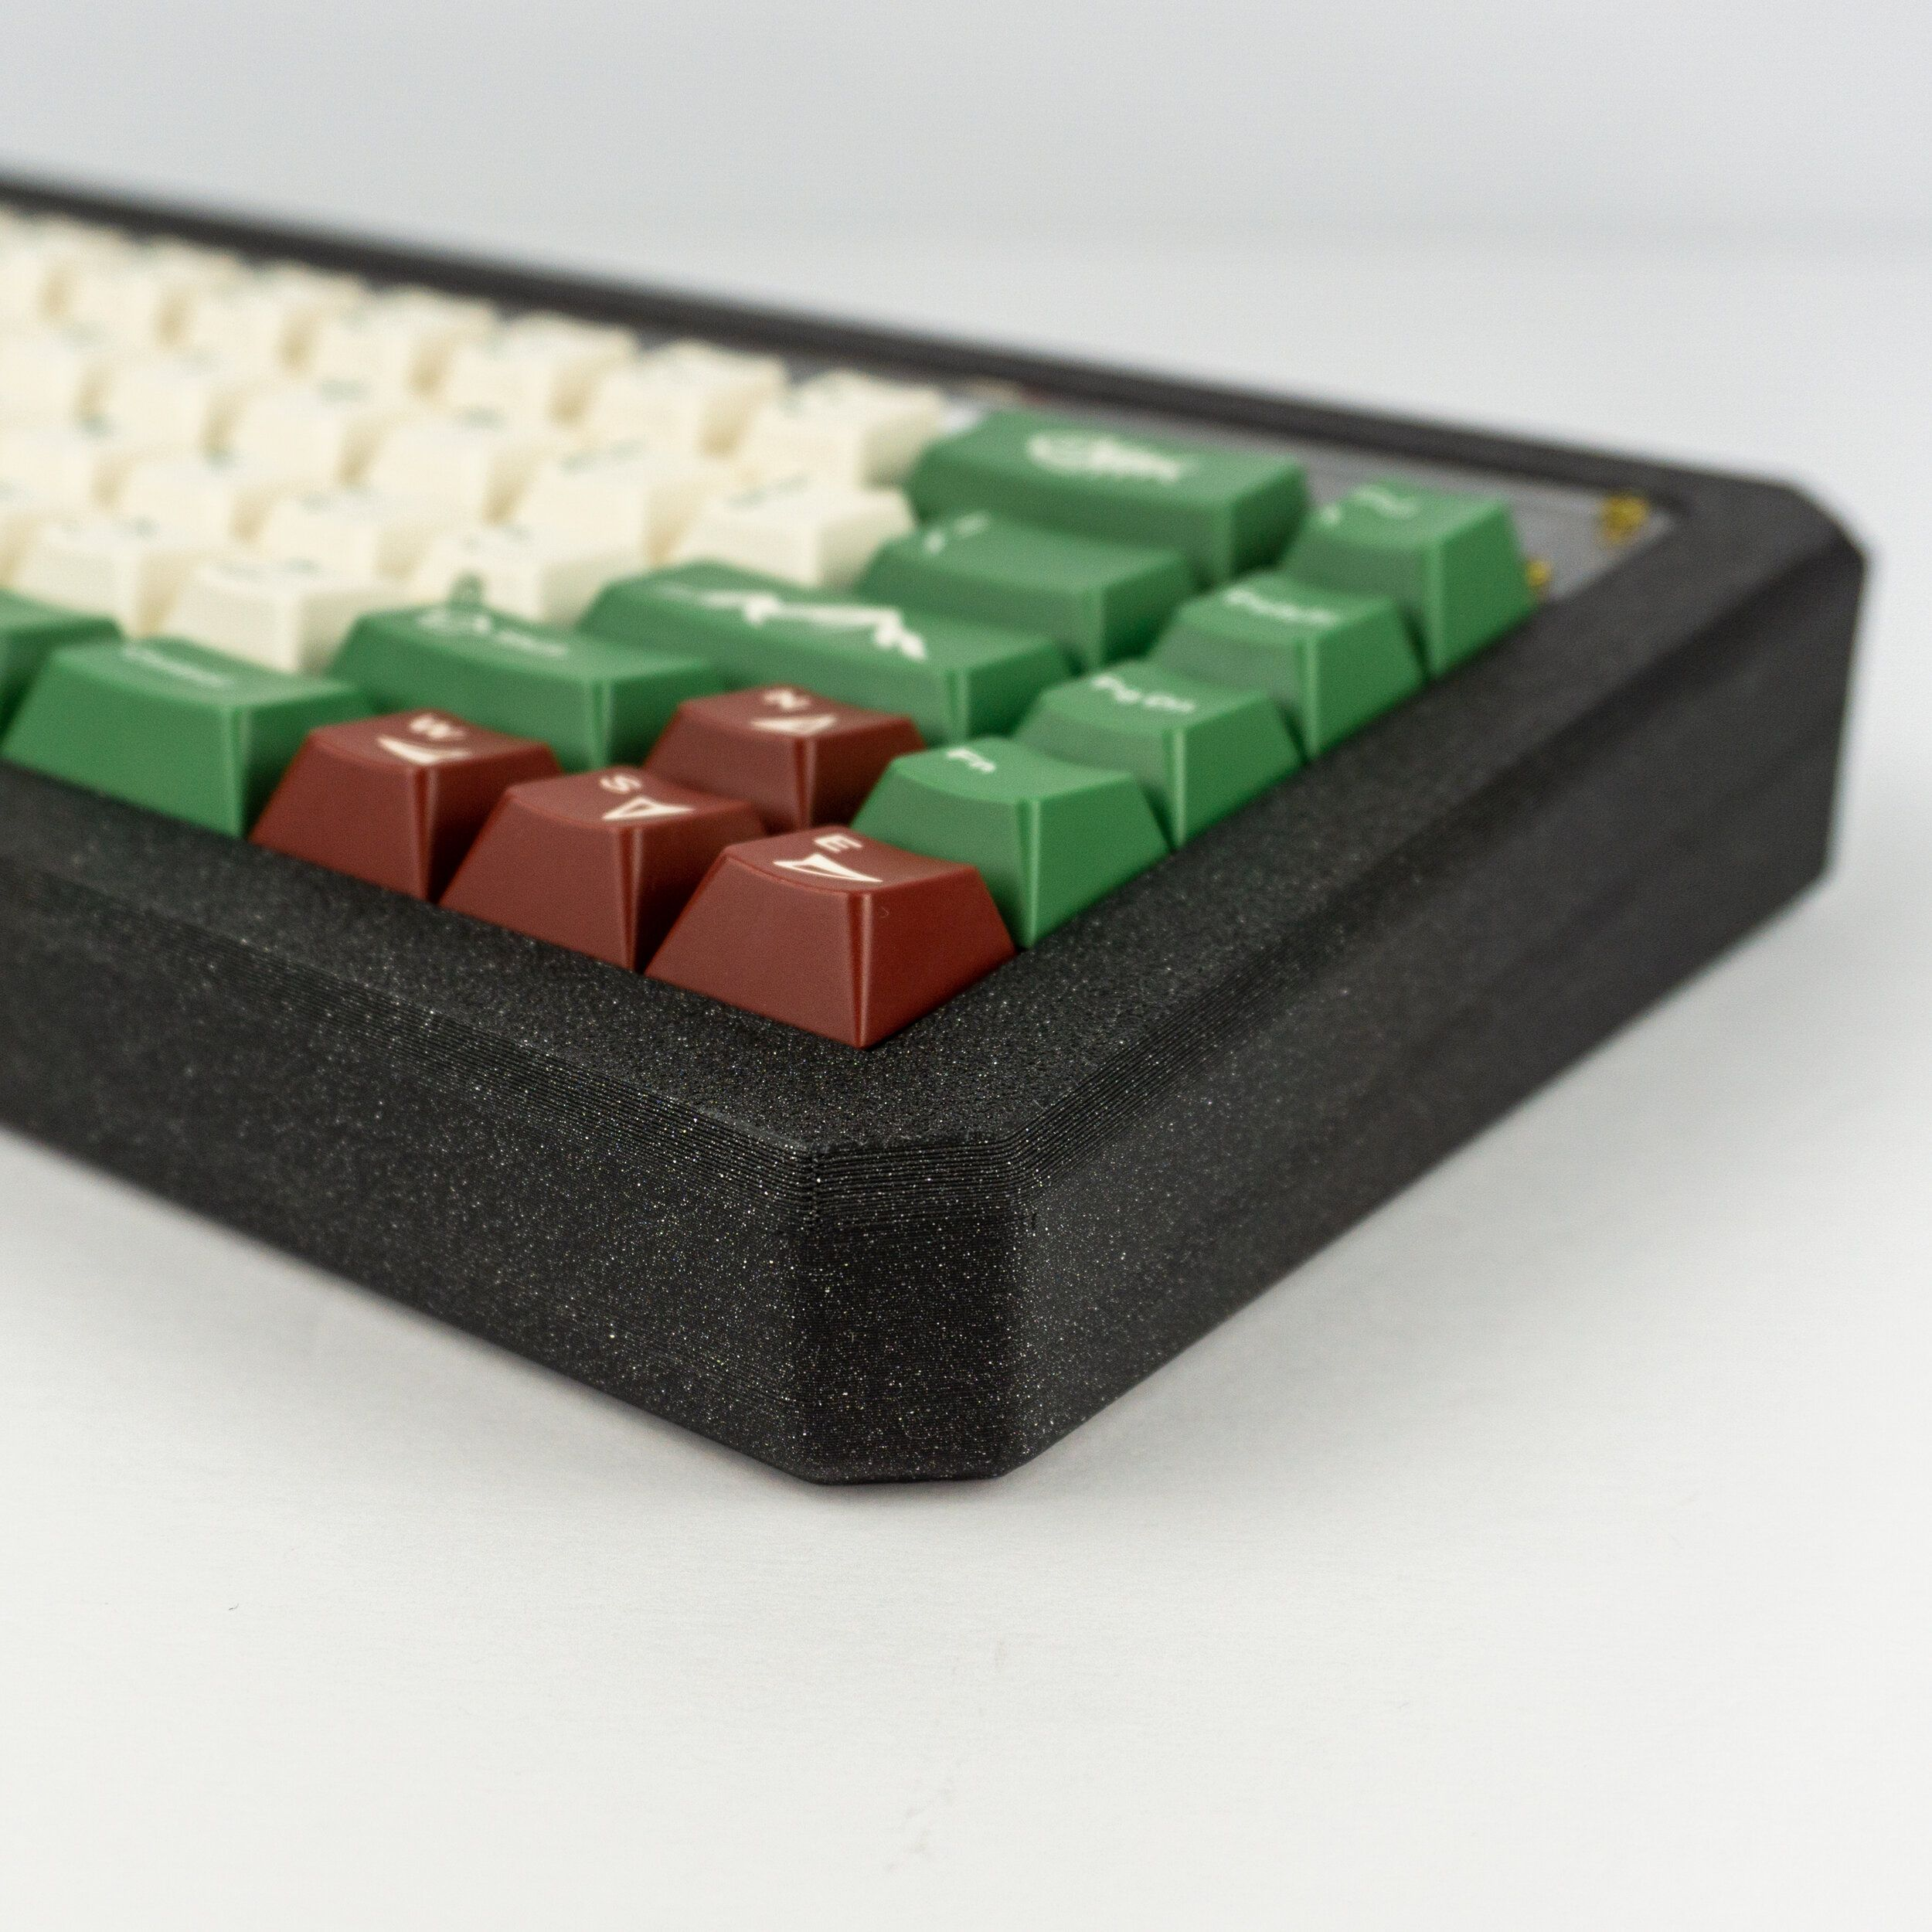 Discipline Keyboard Case V2 P3d Store In 2020 Keyboard Case Case Keyboards